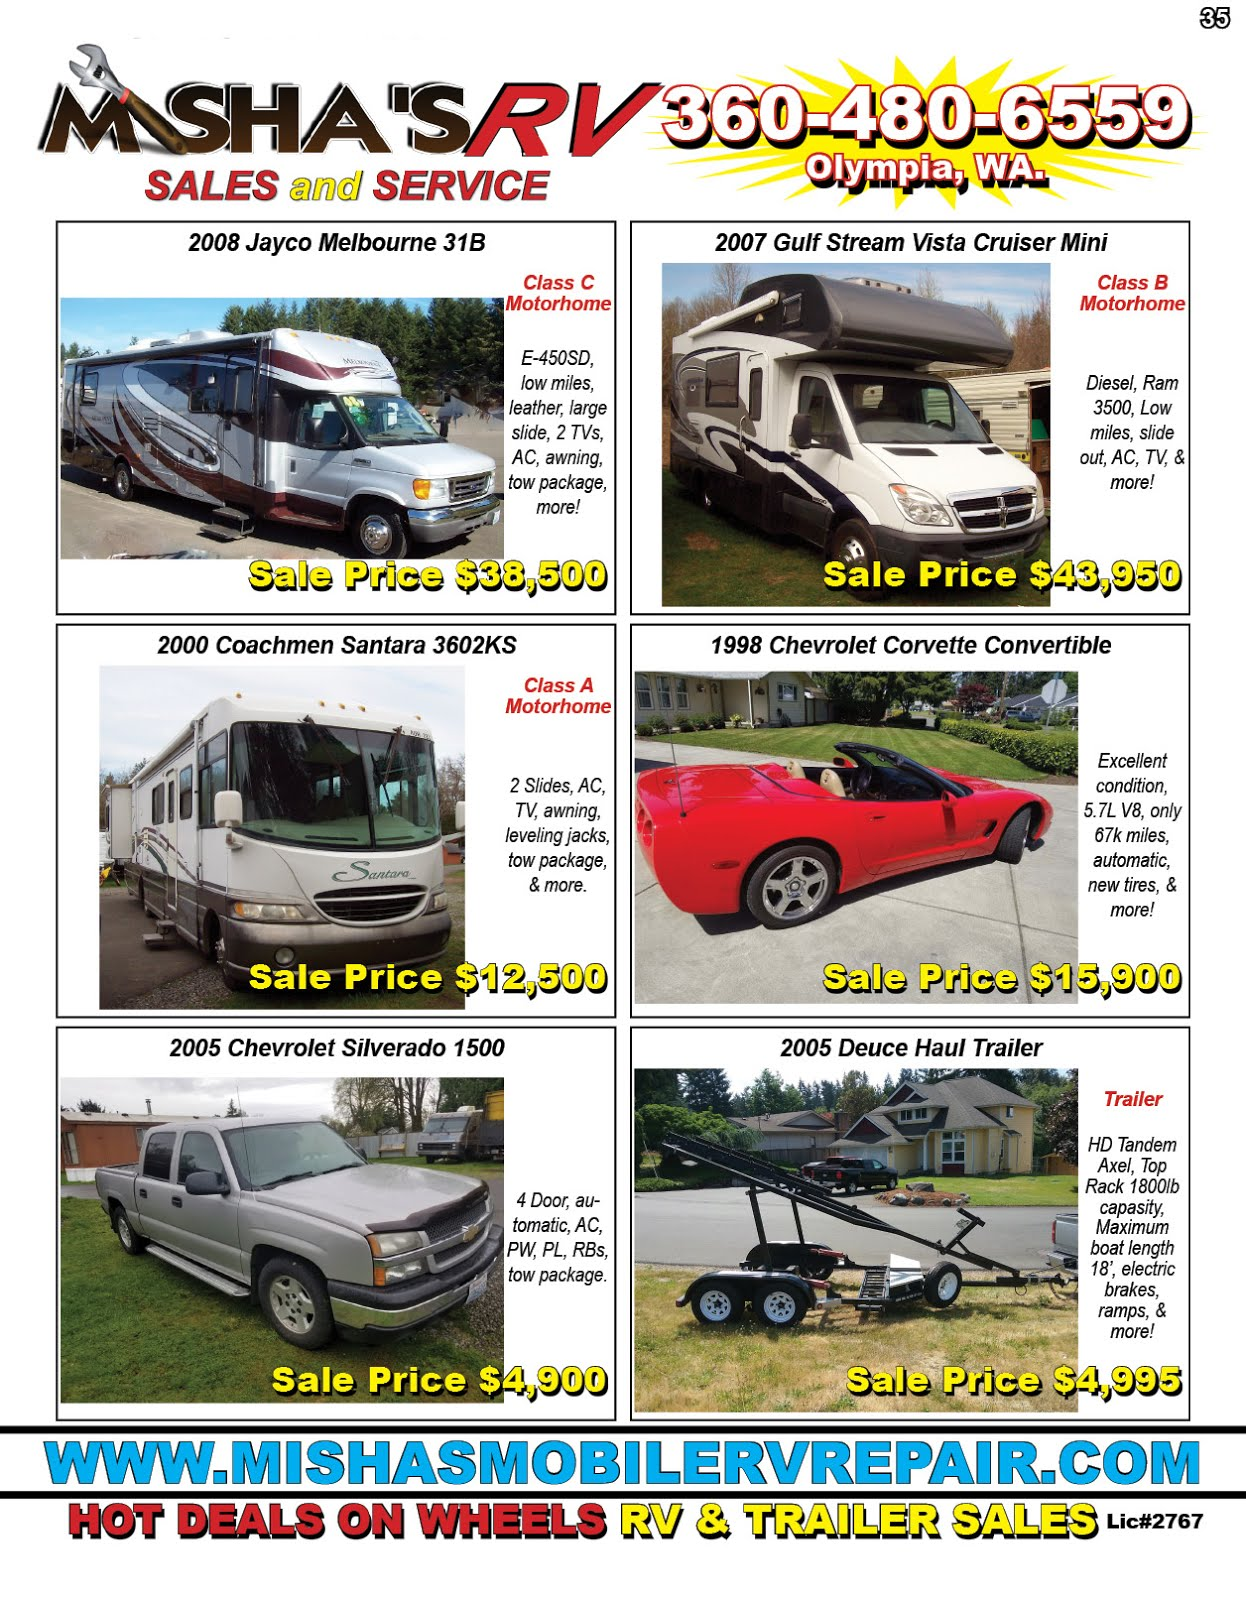 Misha's RV Sales & Service